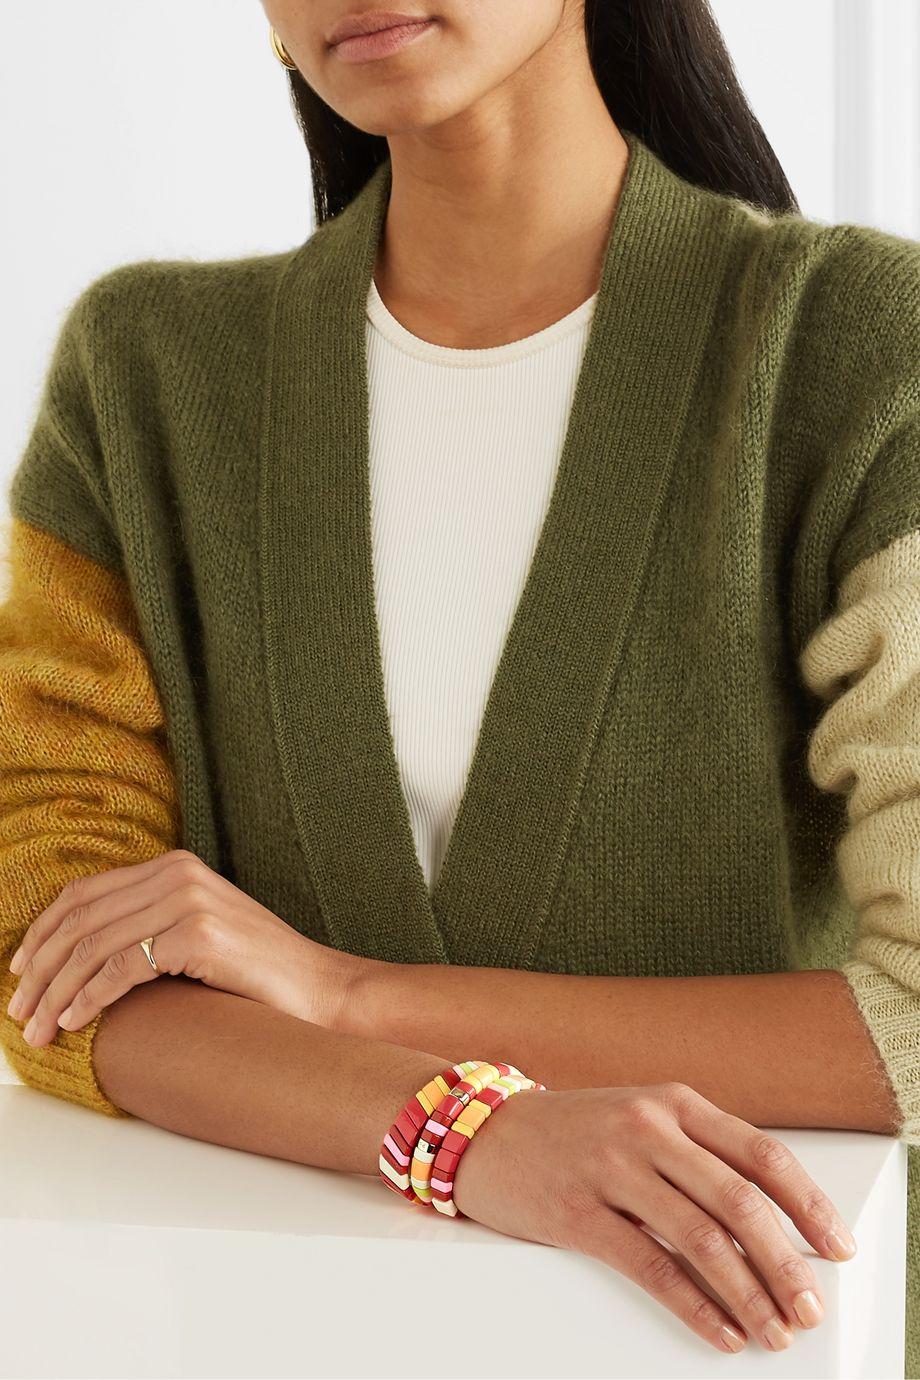 Roxanne Assoulin Negroni 搪瓷金色手链(三只装)